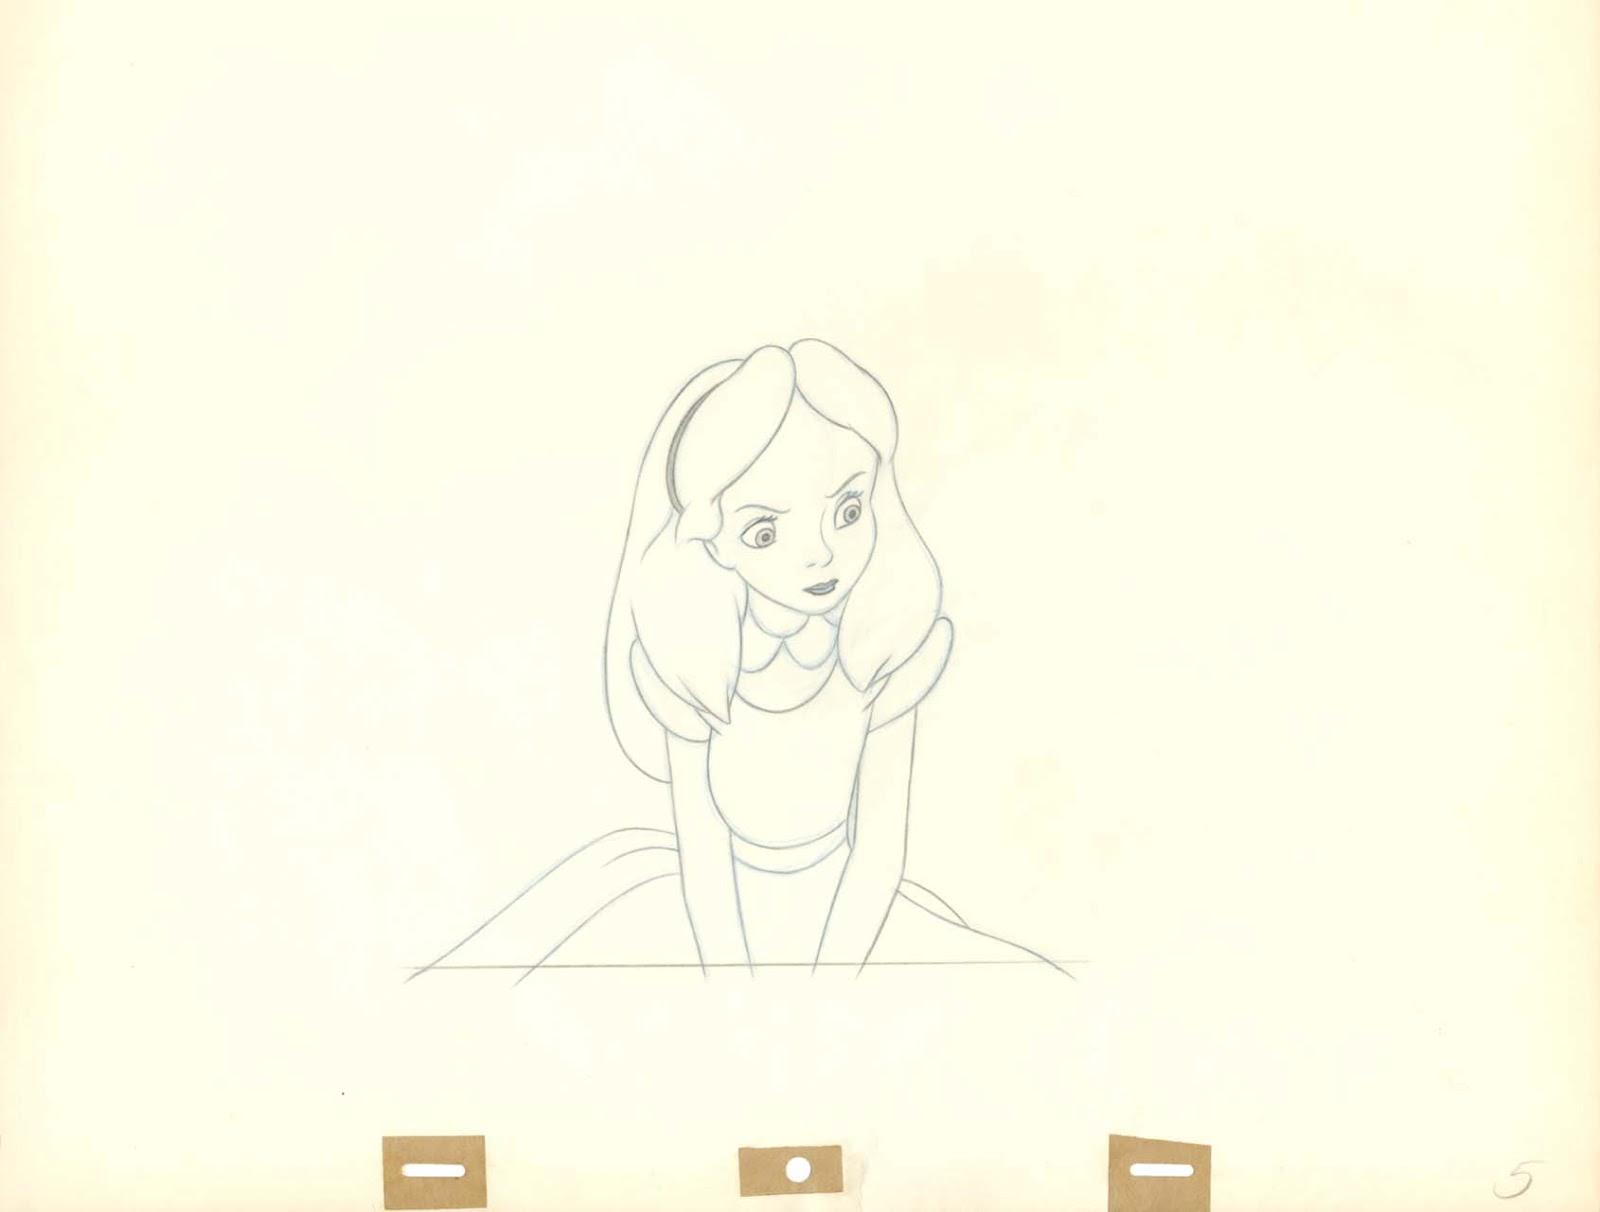 One Line Art Animation : Vintage disney alice in wonderland: looks annoyed animation